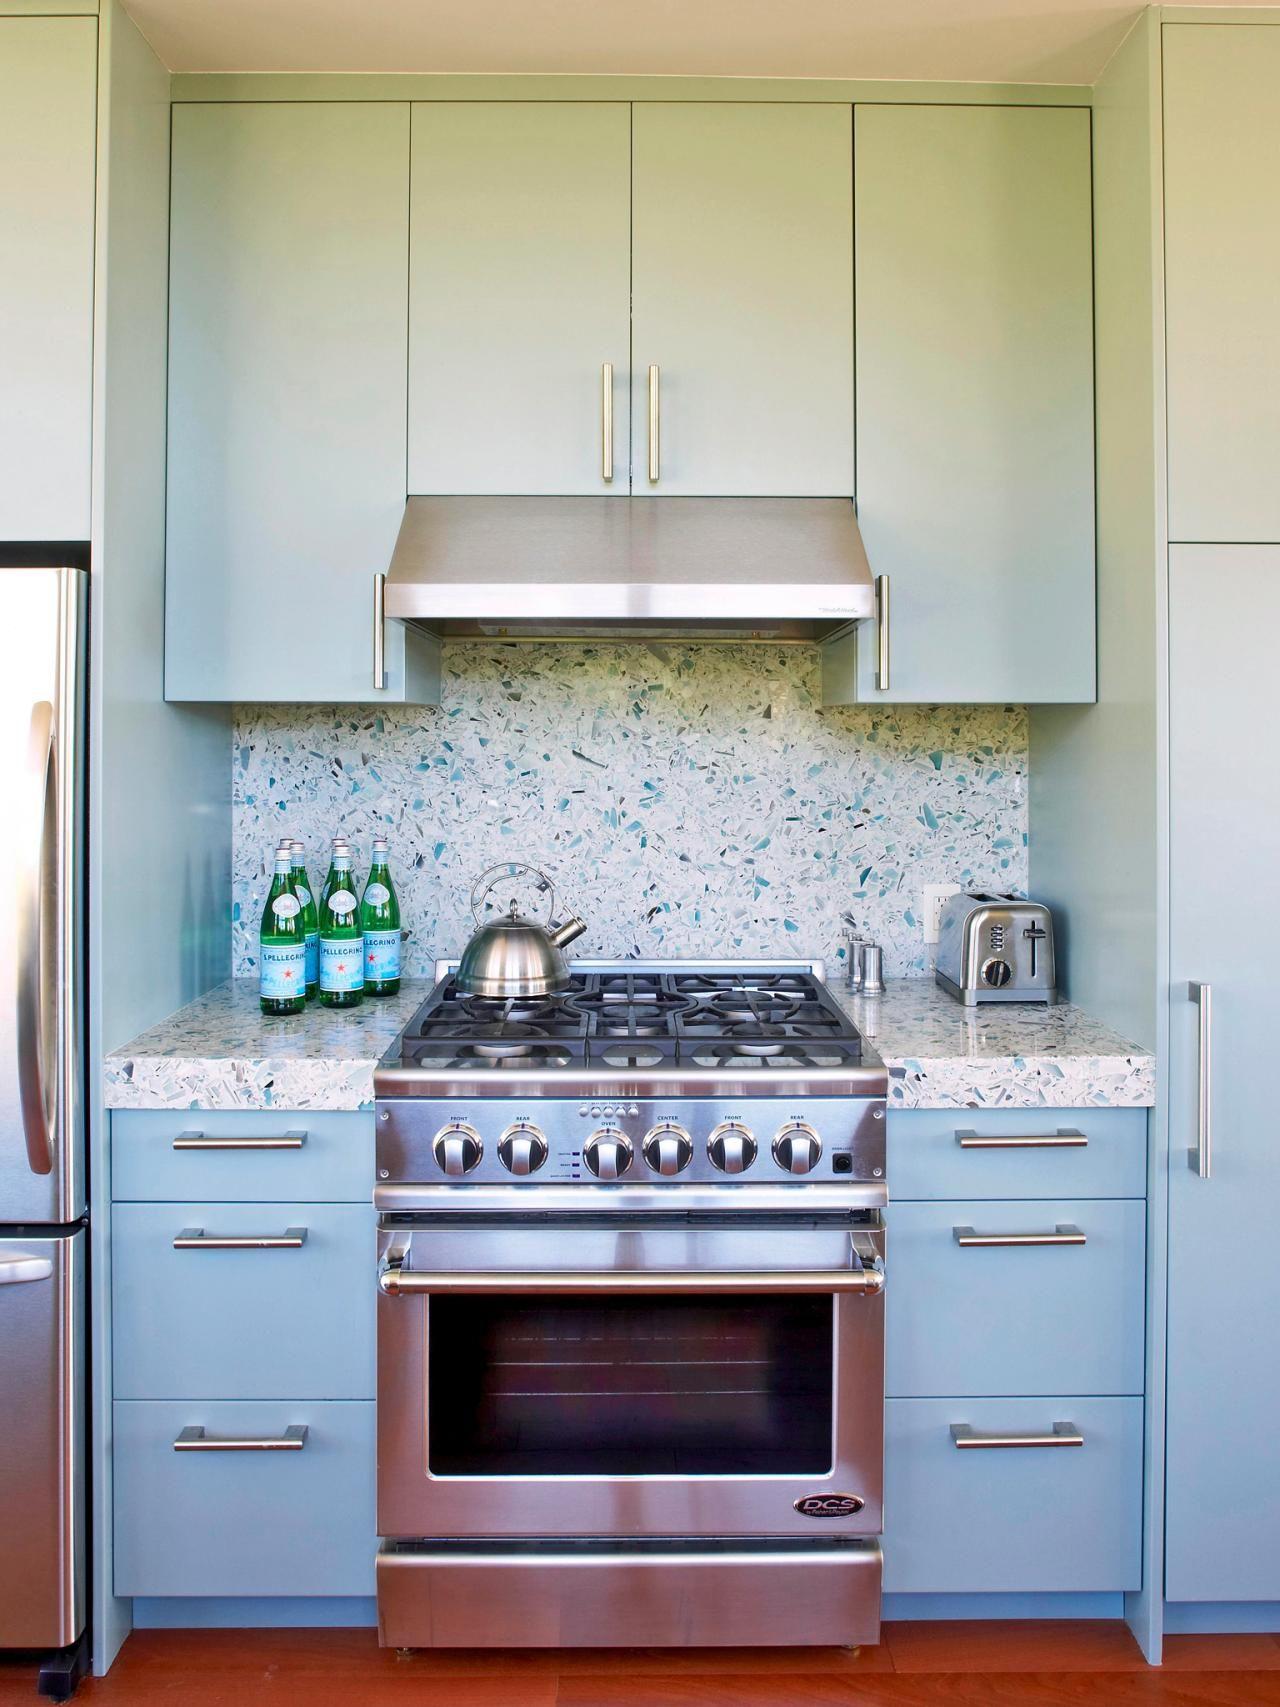 Dreamy Kitchen Backsplashes | Terrazzo, Concrete and Reuse